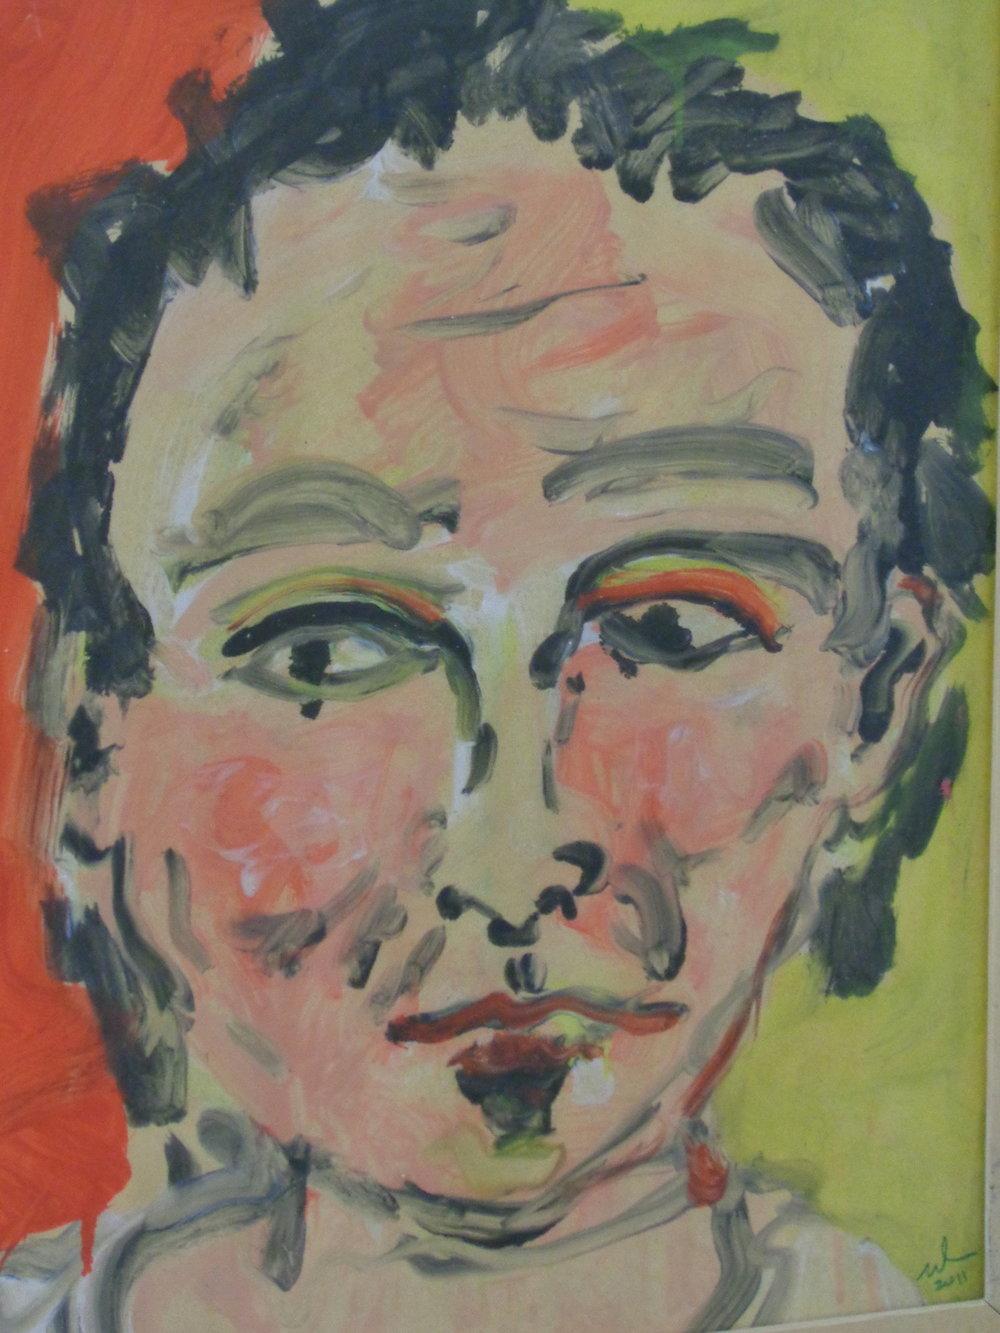 Self Portrait - Oil on paper 2010